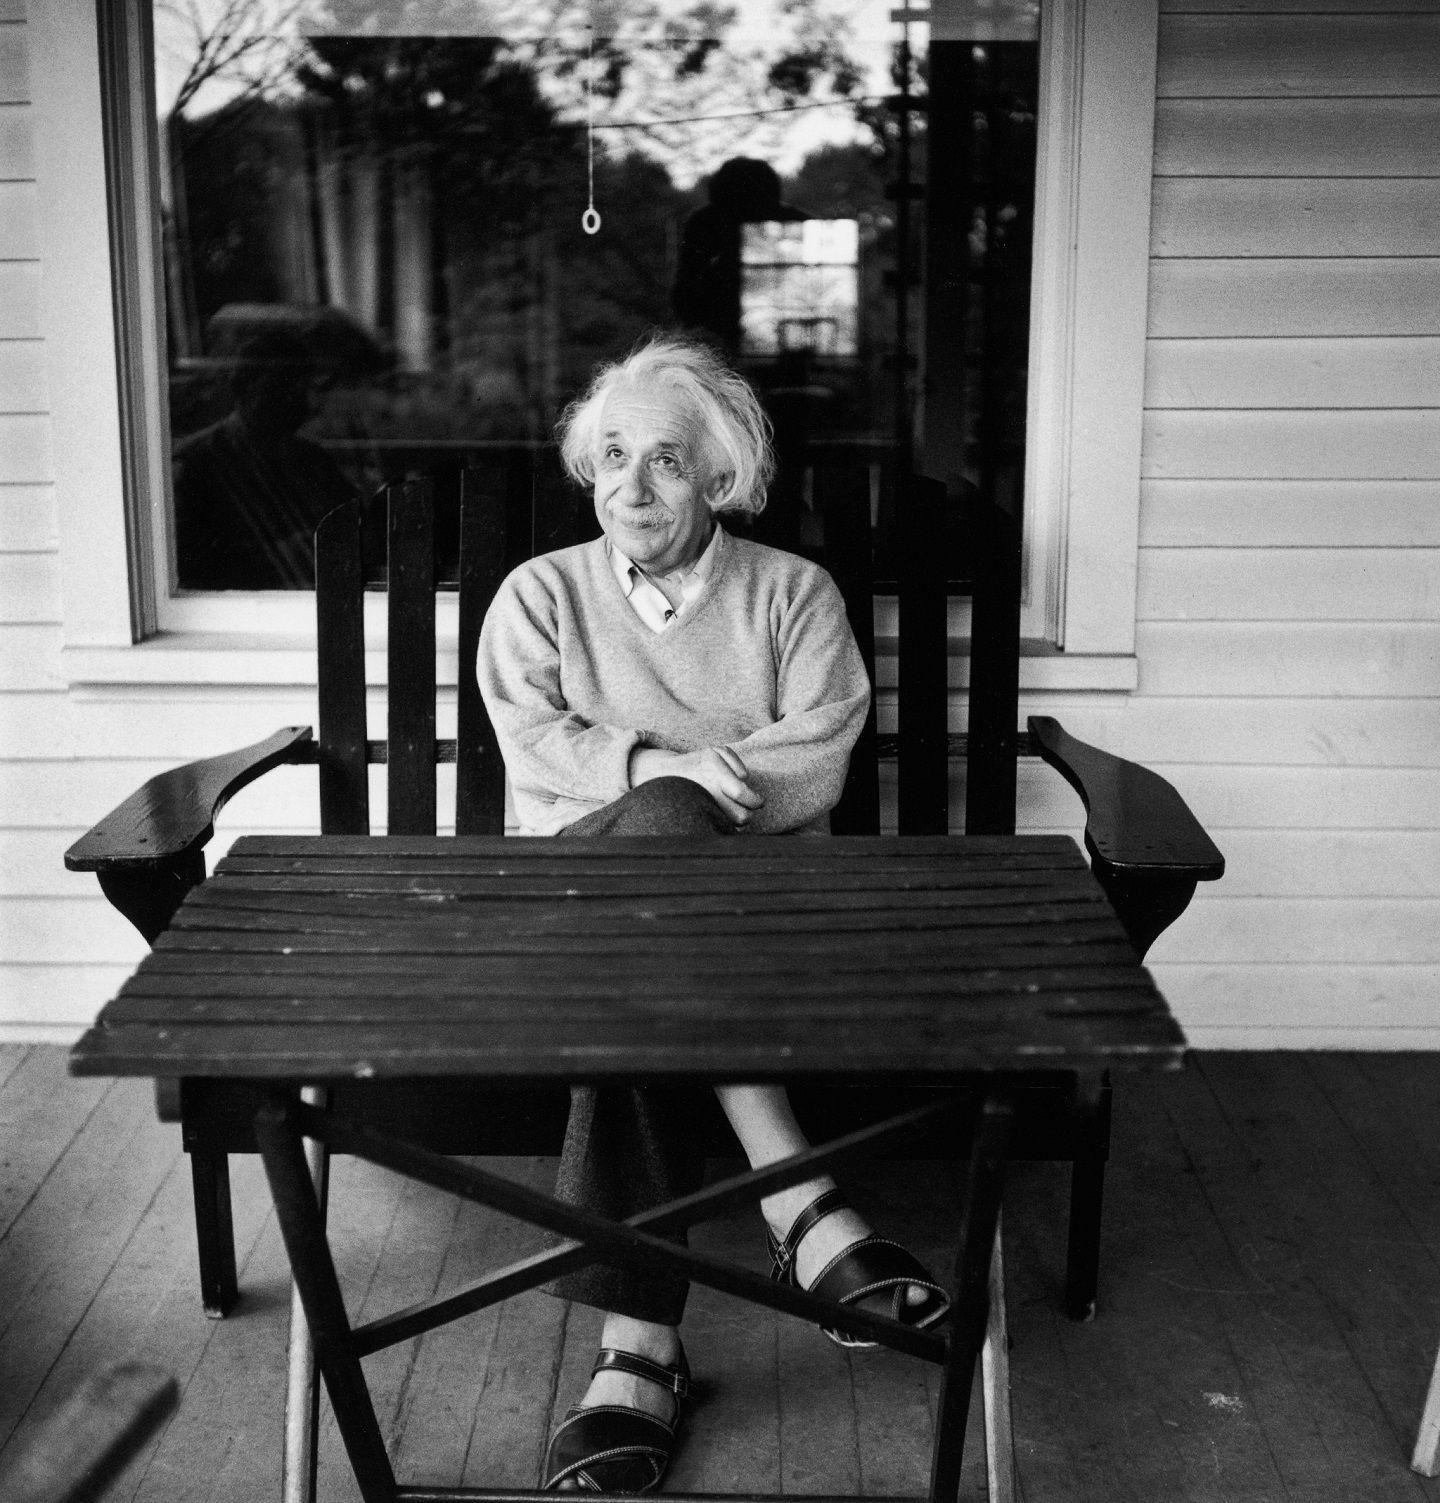 Muebles Einstein - Albert Einstein Mensajes Pinterest Mensajes[mjhdah]https://i.ytimg.com/vi/6hfvloDO9fw/maxresdefault.jpg